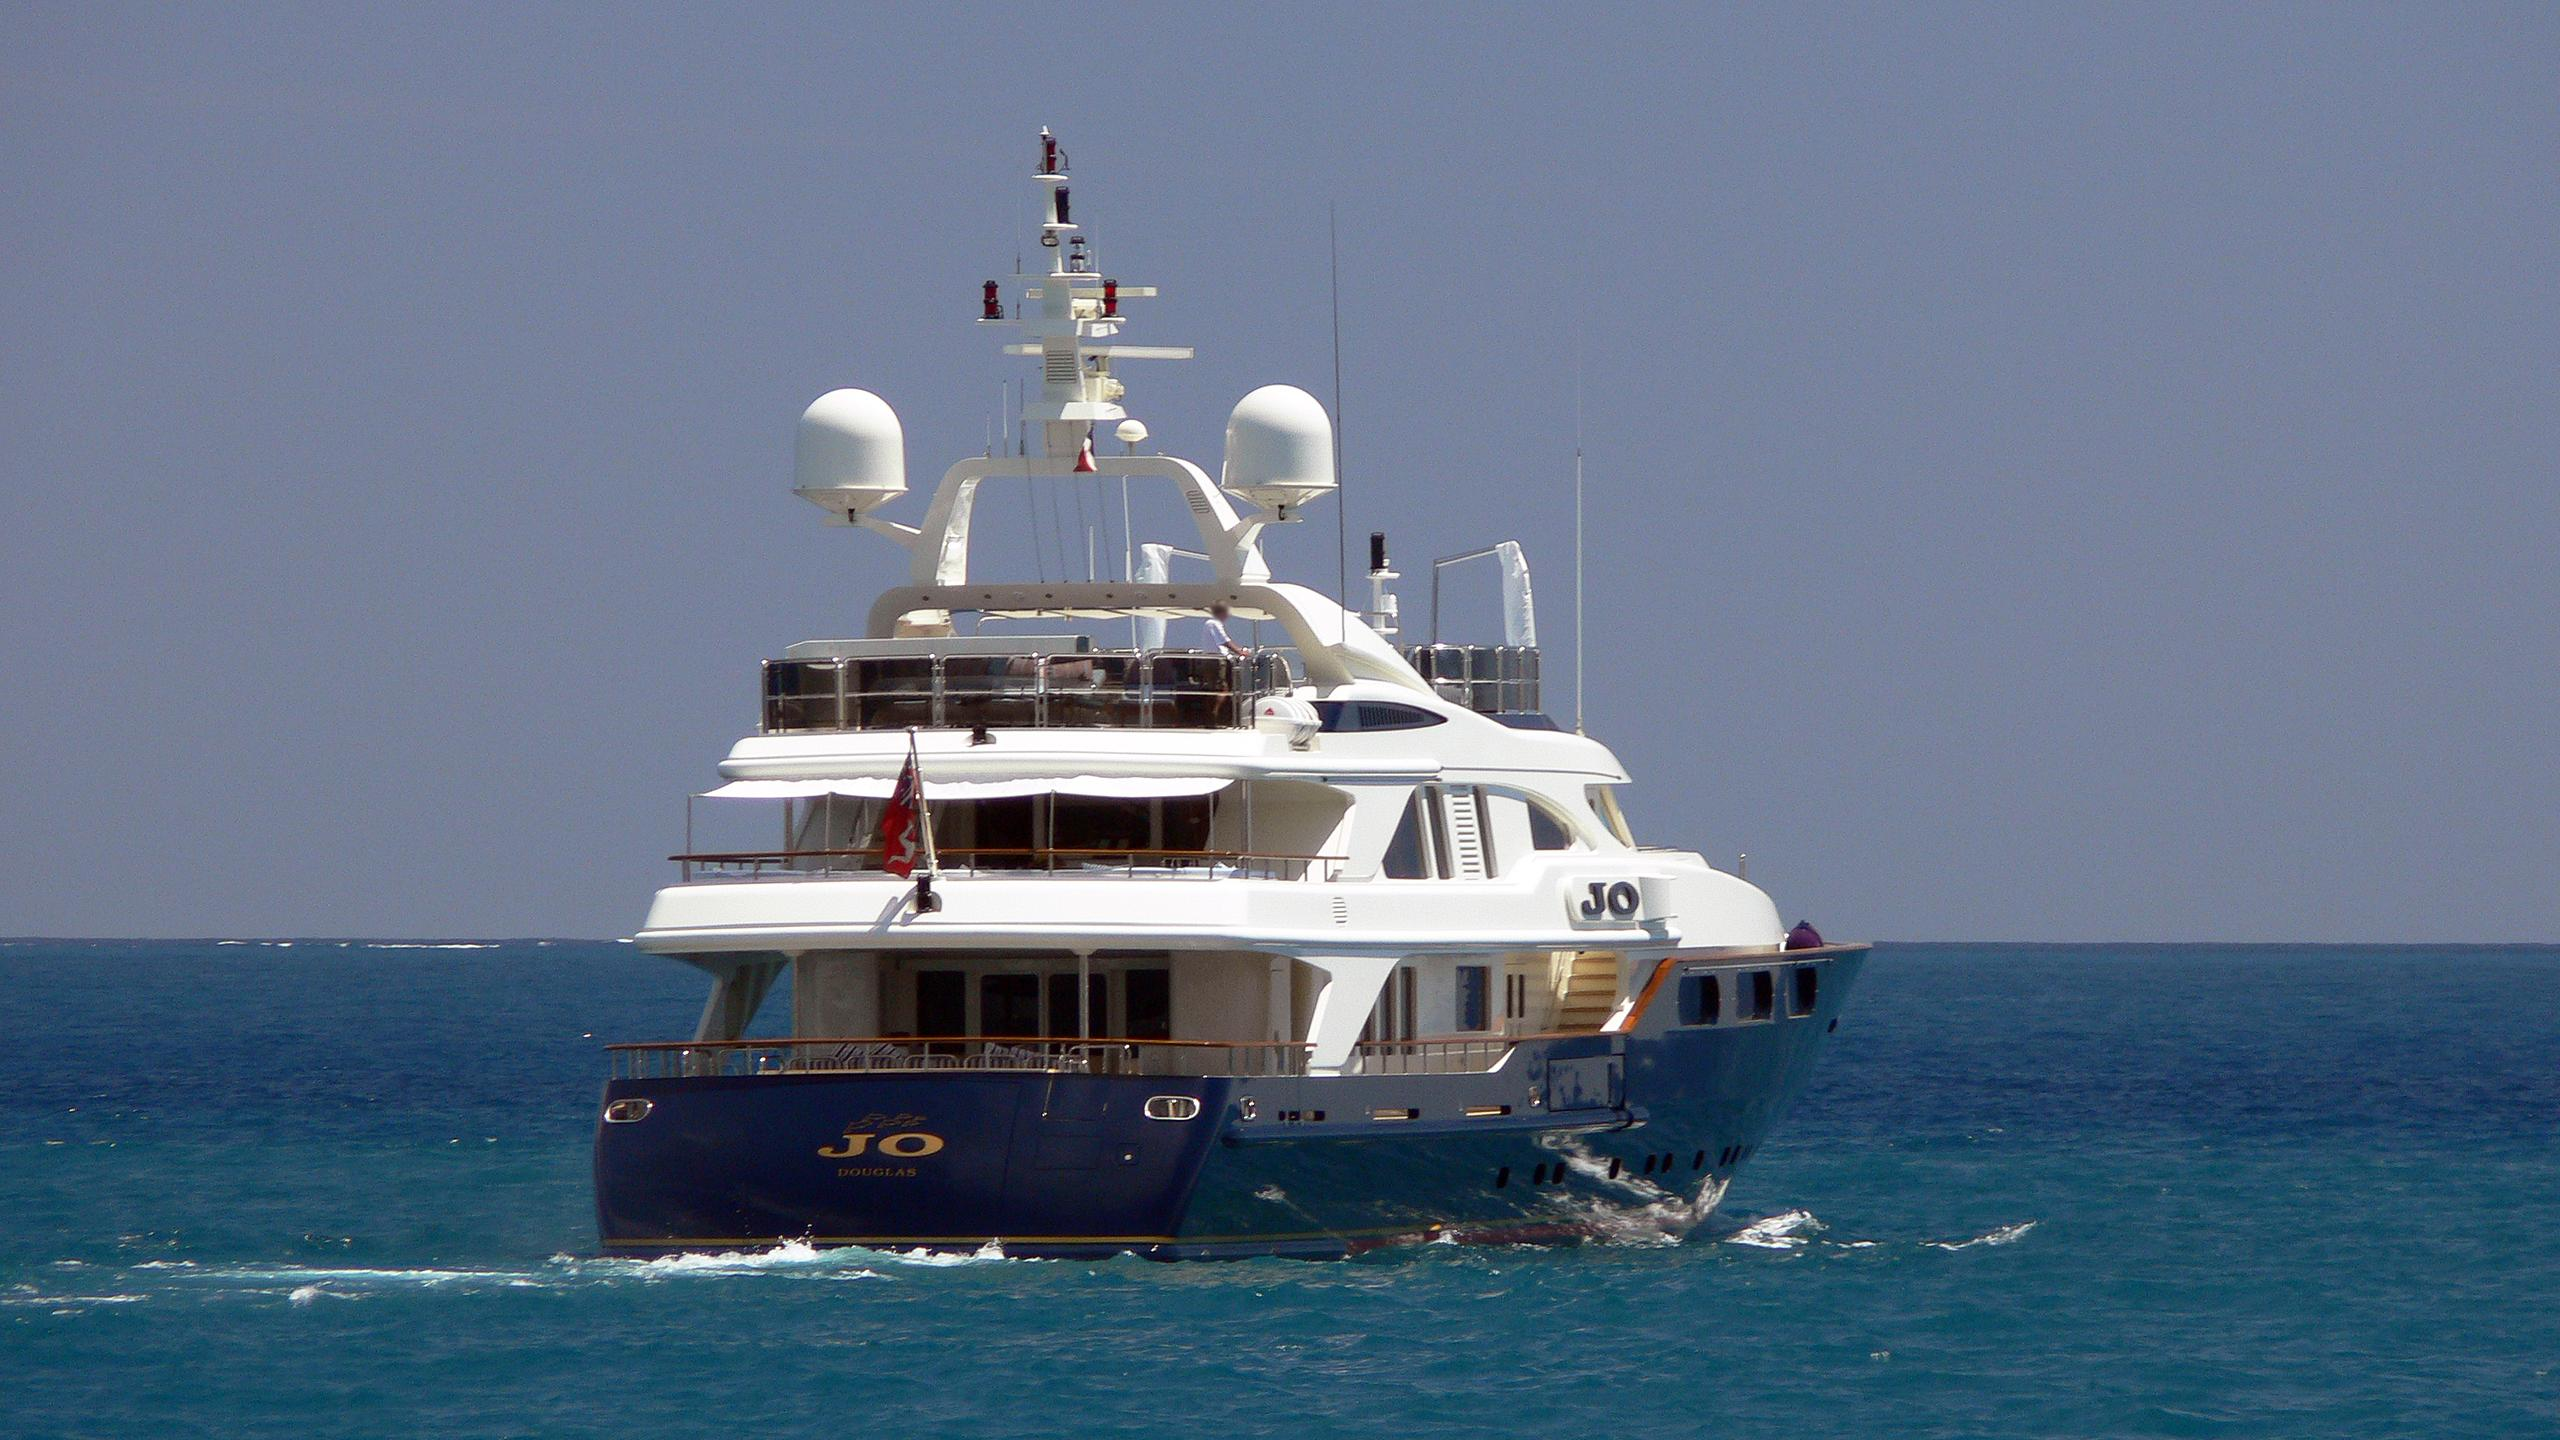 jo-motor-yacht-benetti-golden-bay-2004-50m-cruising-stern